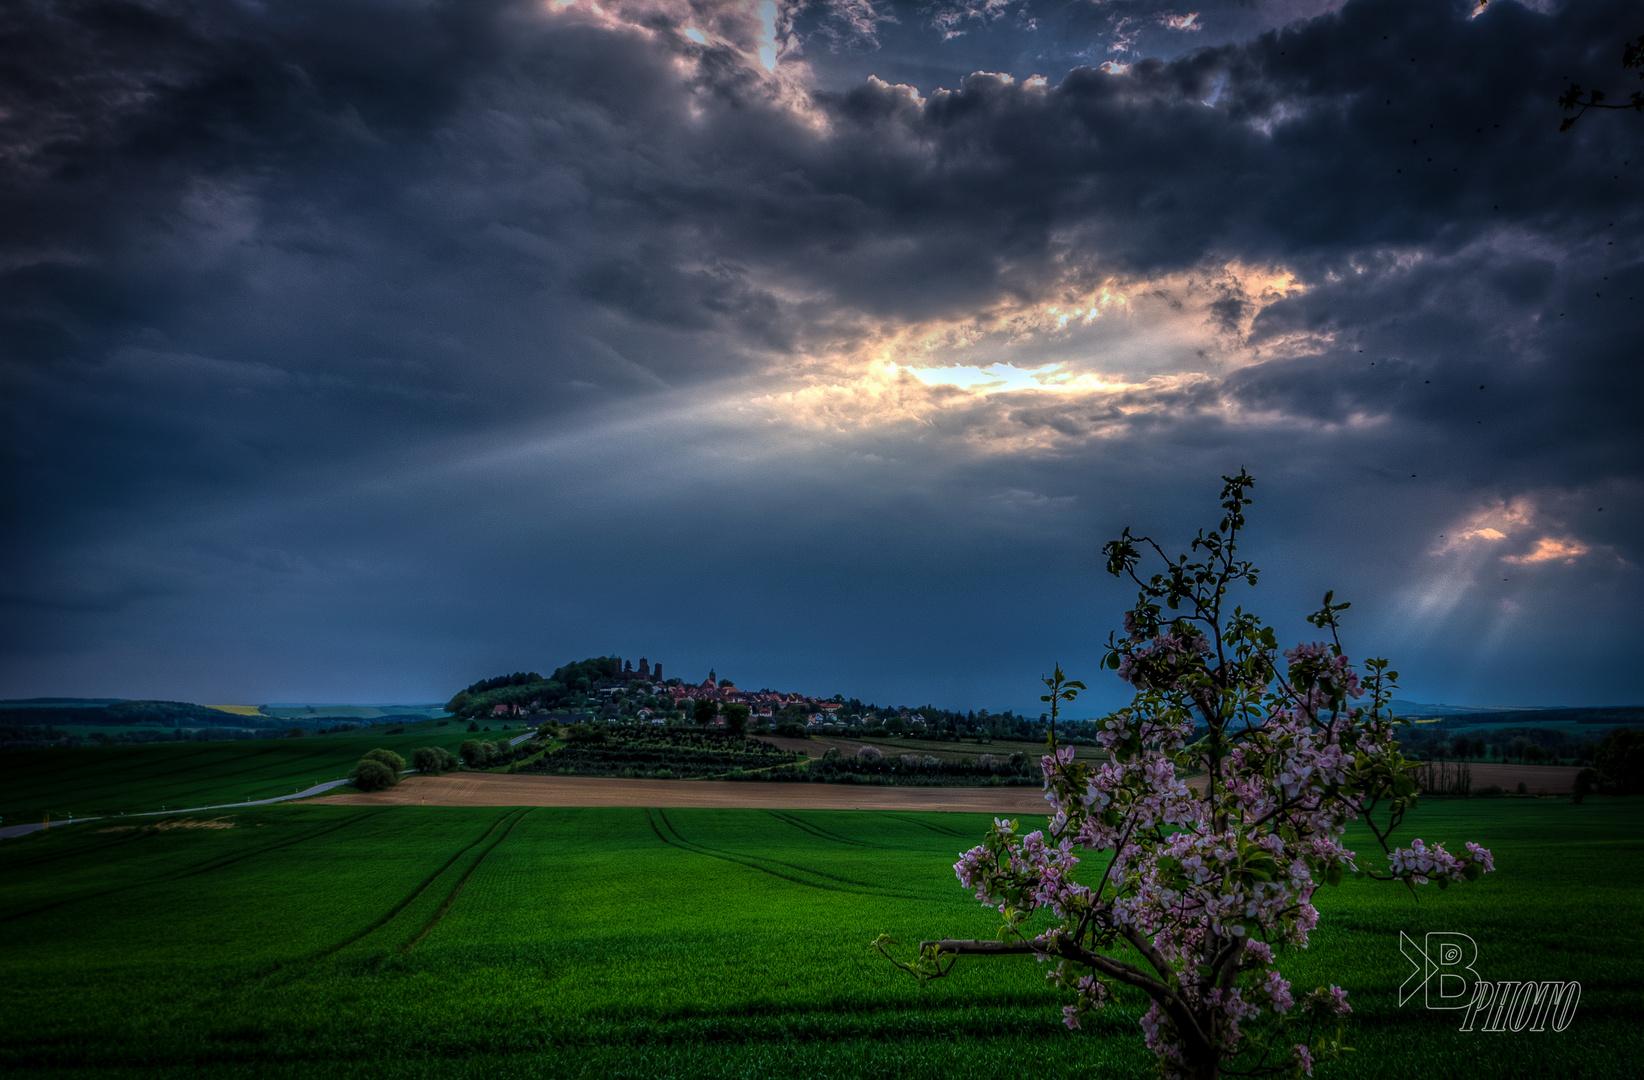 Blick zur Burg Stolpen, bevor der Regen kam